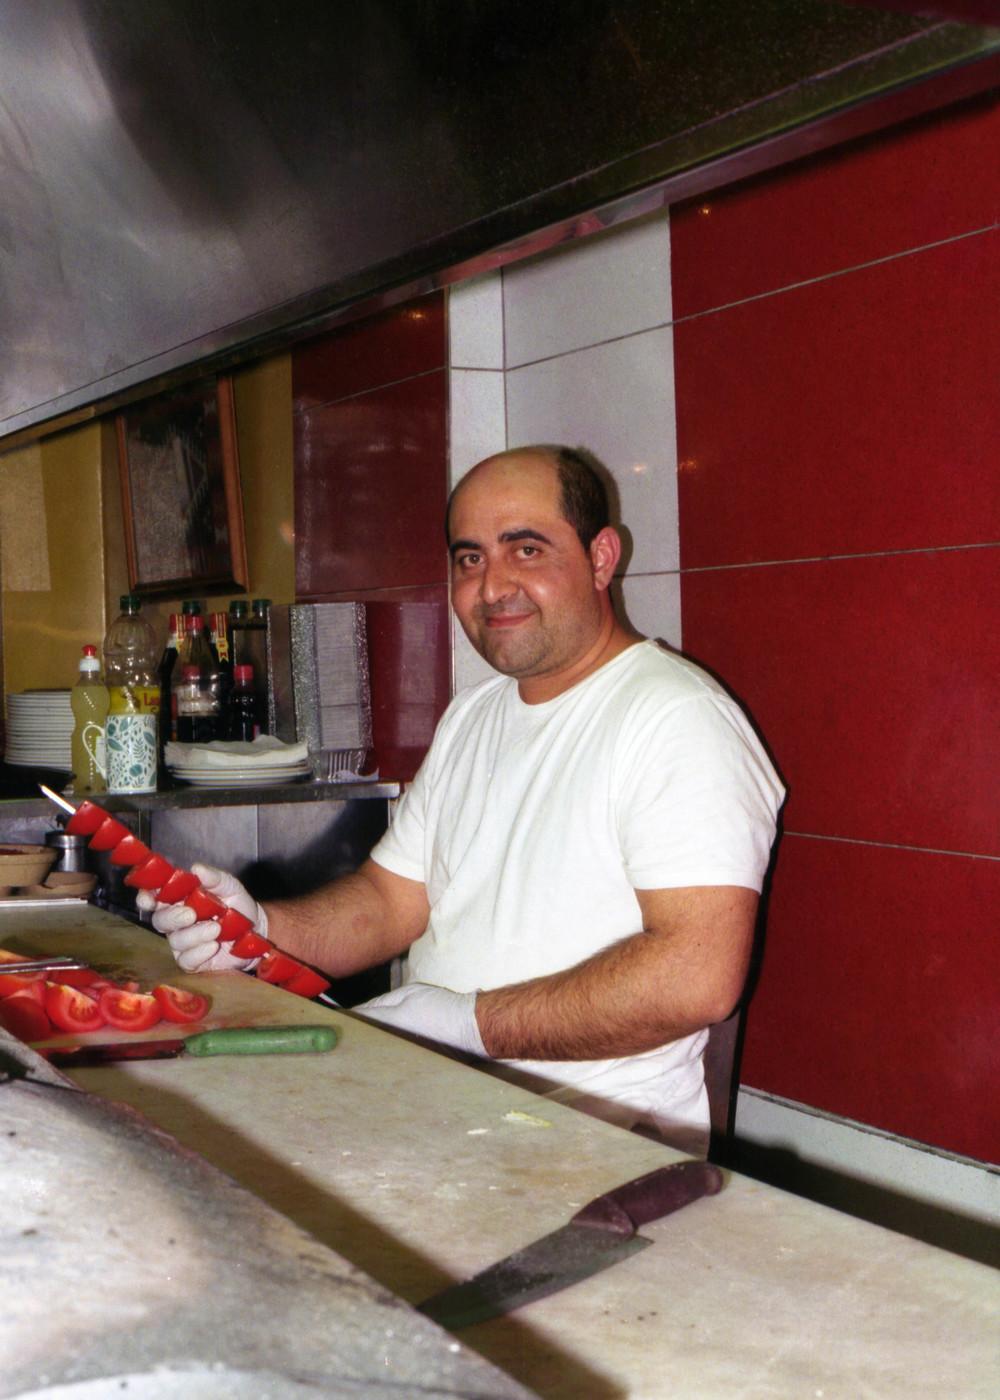 chef_1 2.jpg